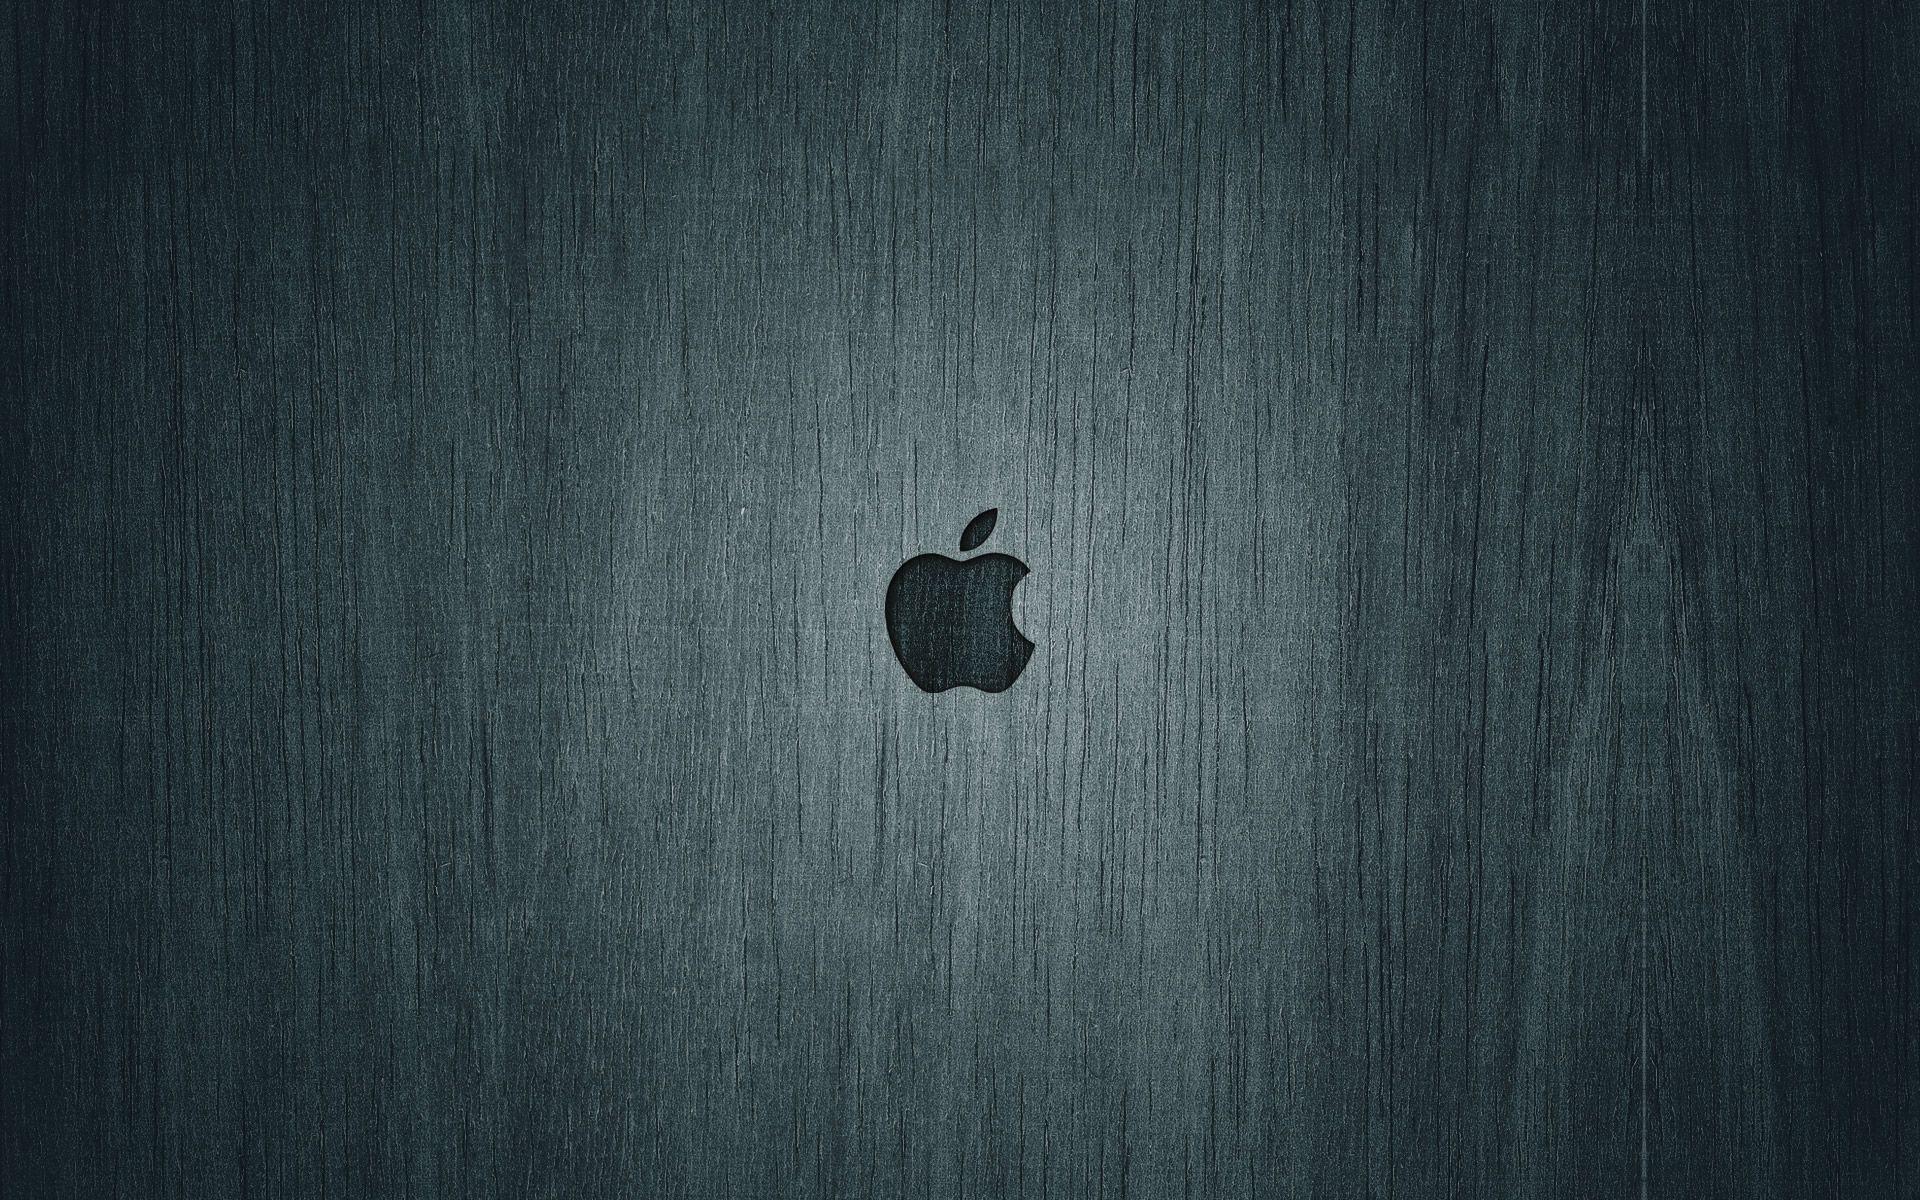 Cool Desktop Backgrounds Mac